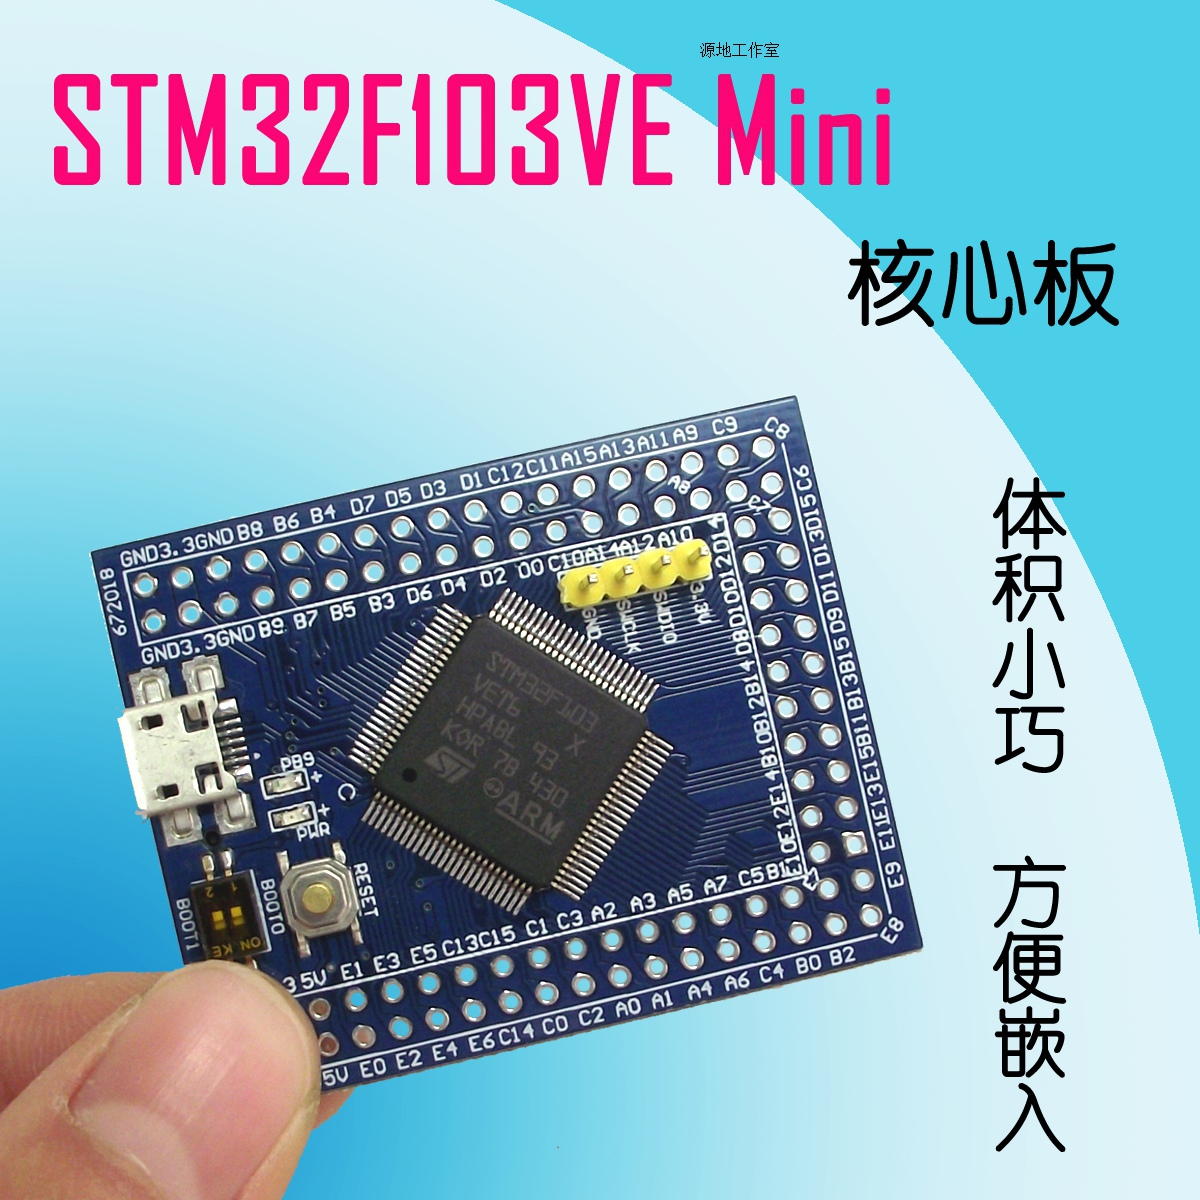 STM32F103VET6 Mini version of the core board minimum system version STM32 minimum of two